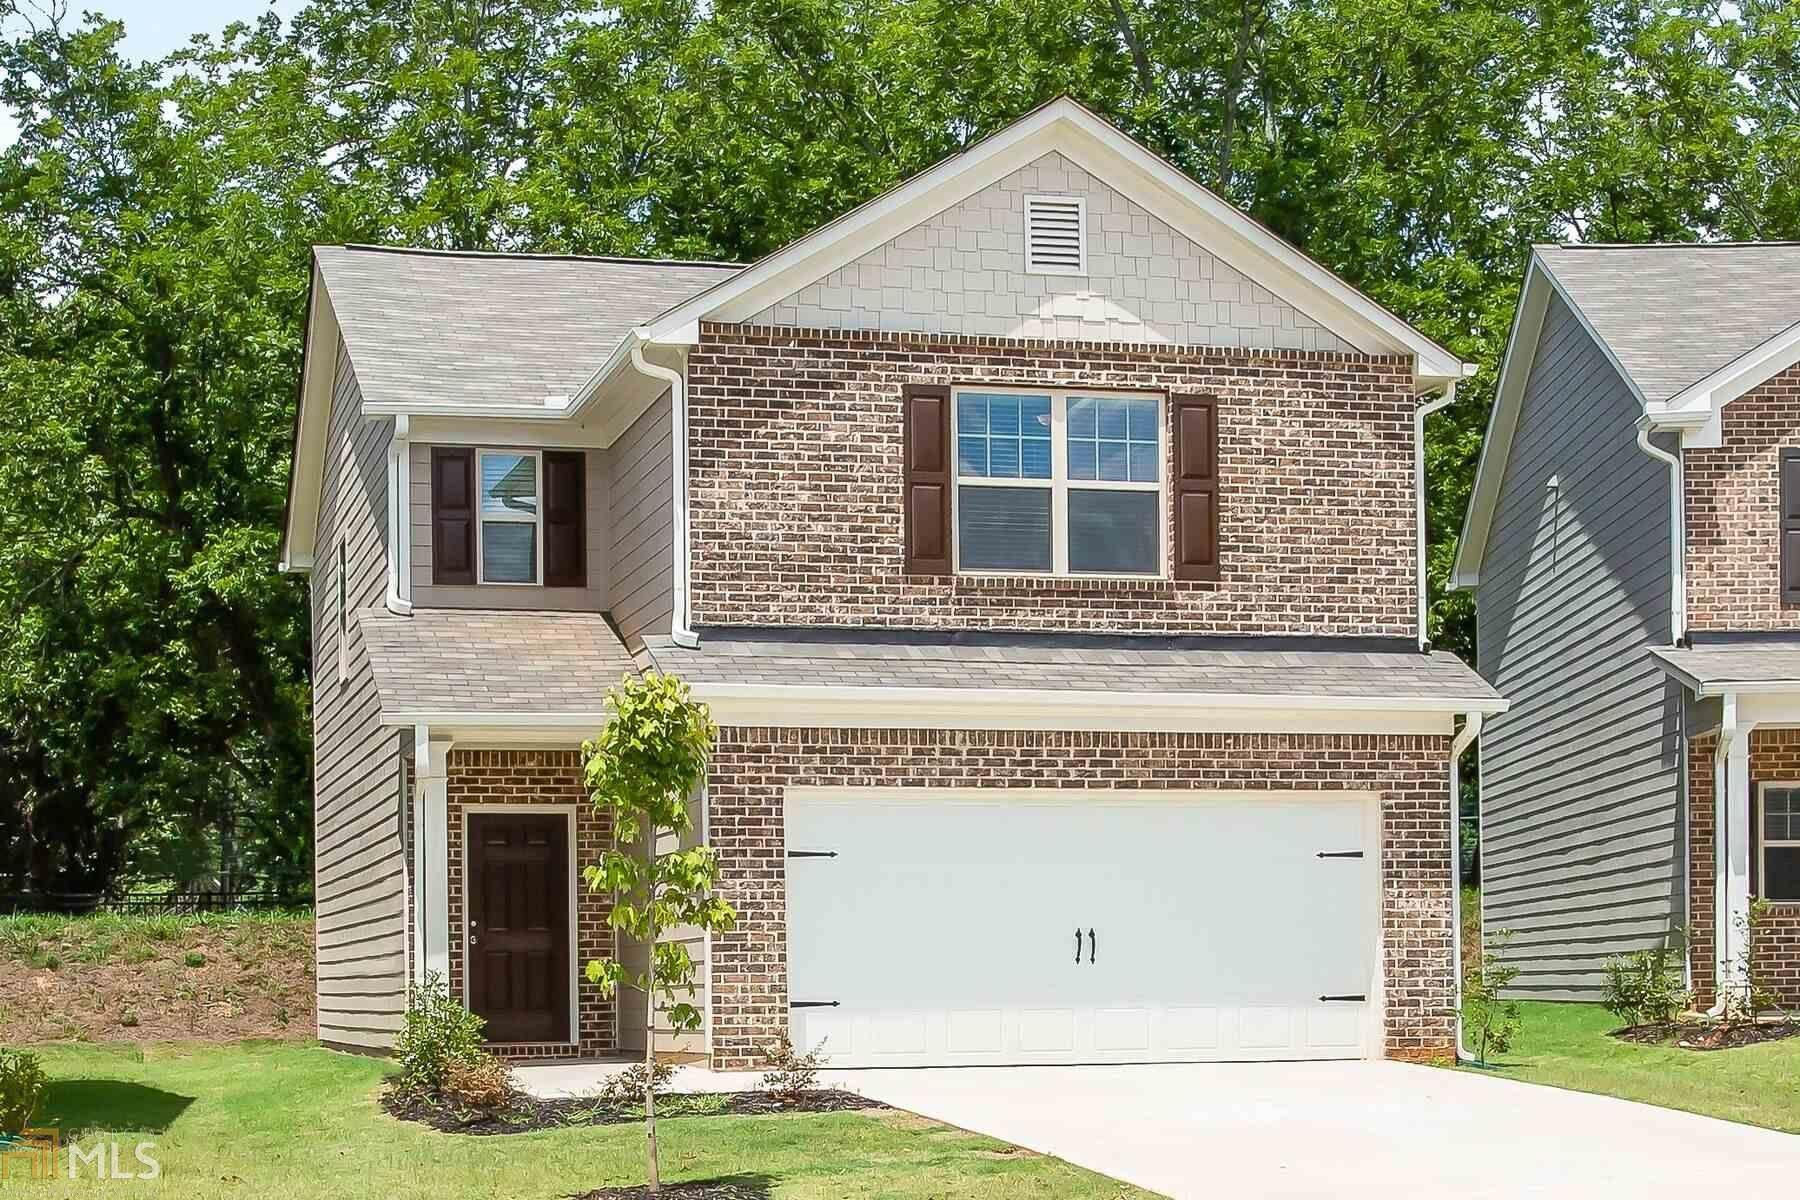 11400 Kilpatrick Ln, Hampton, GA 30228 - MLS#: 8851763